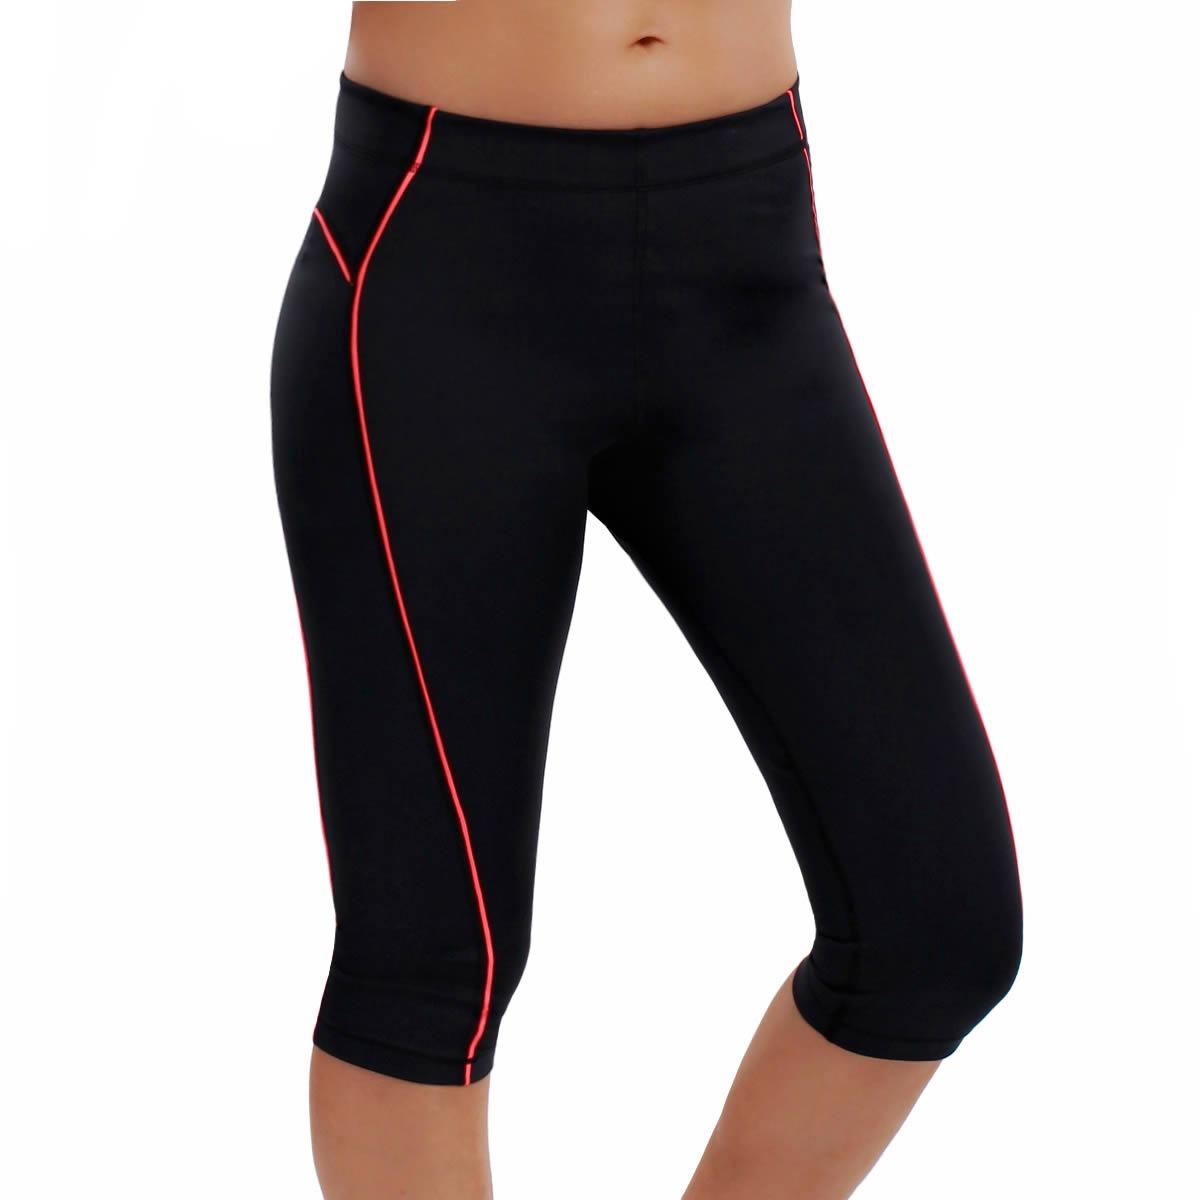 La Isla Women's Fitted Yoga Running Workout Sports Capri